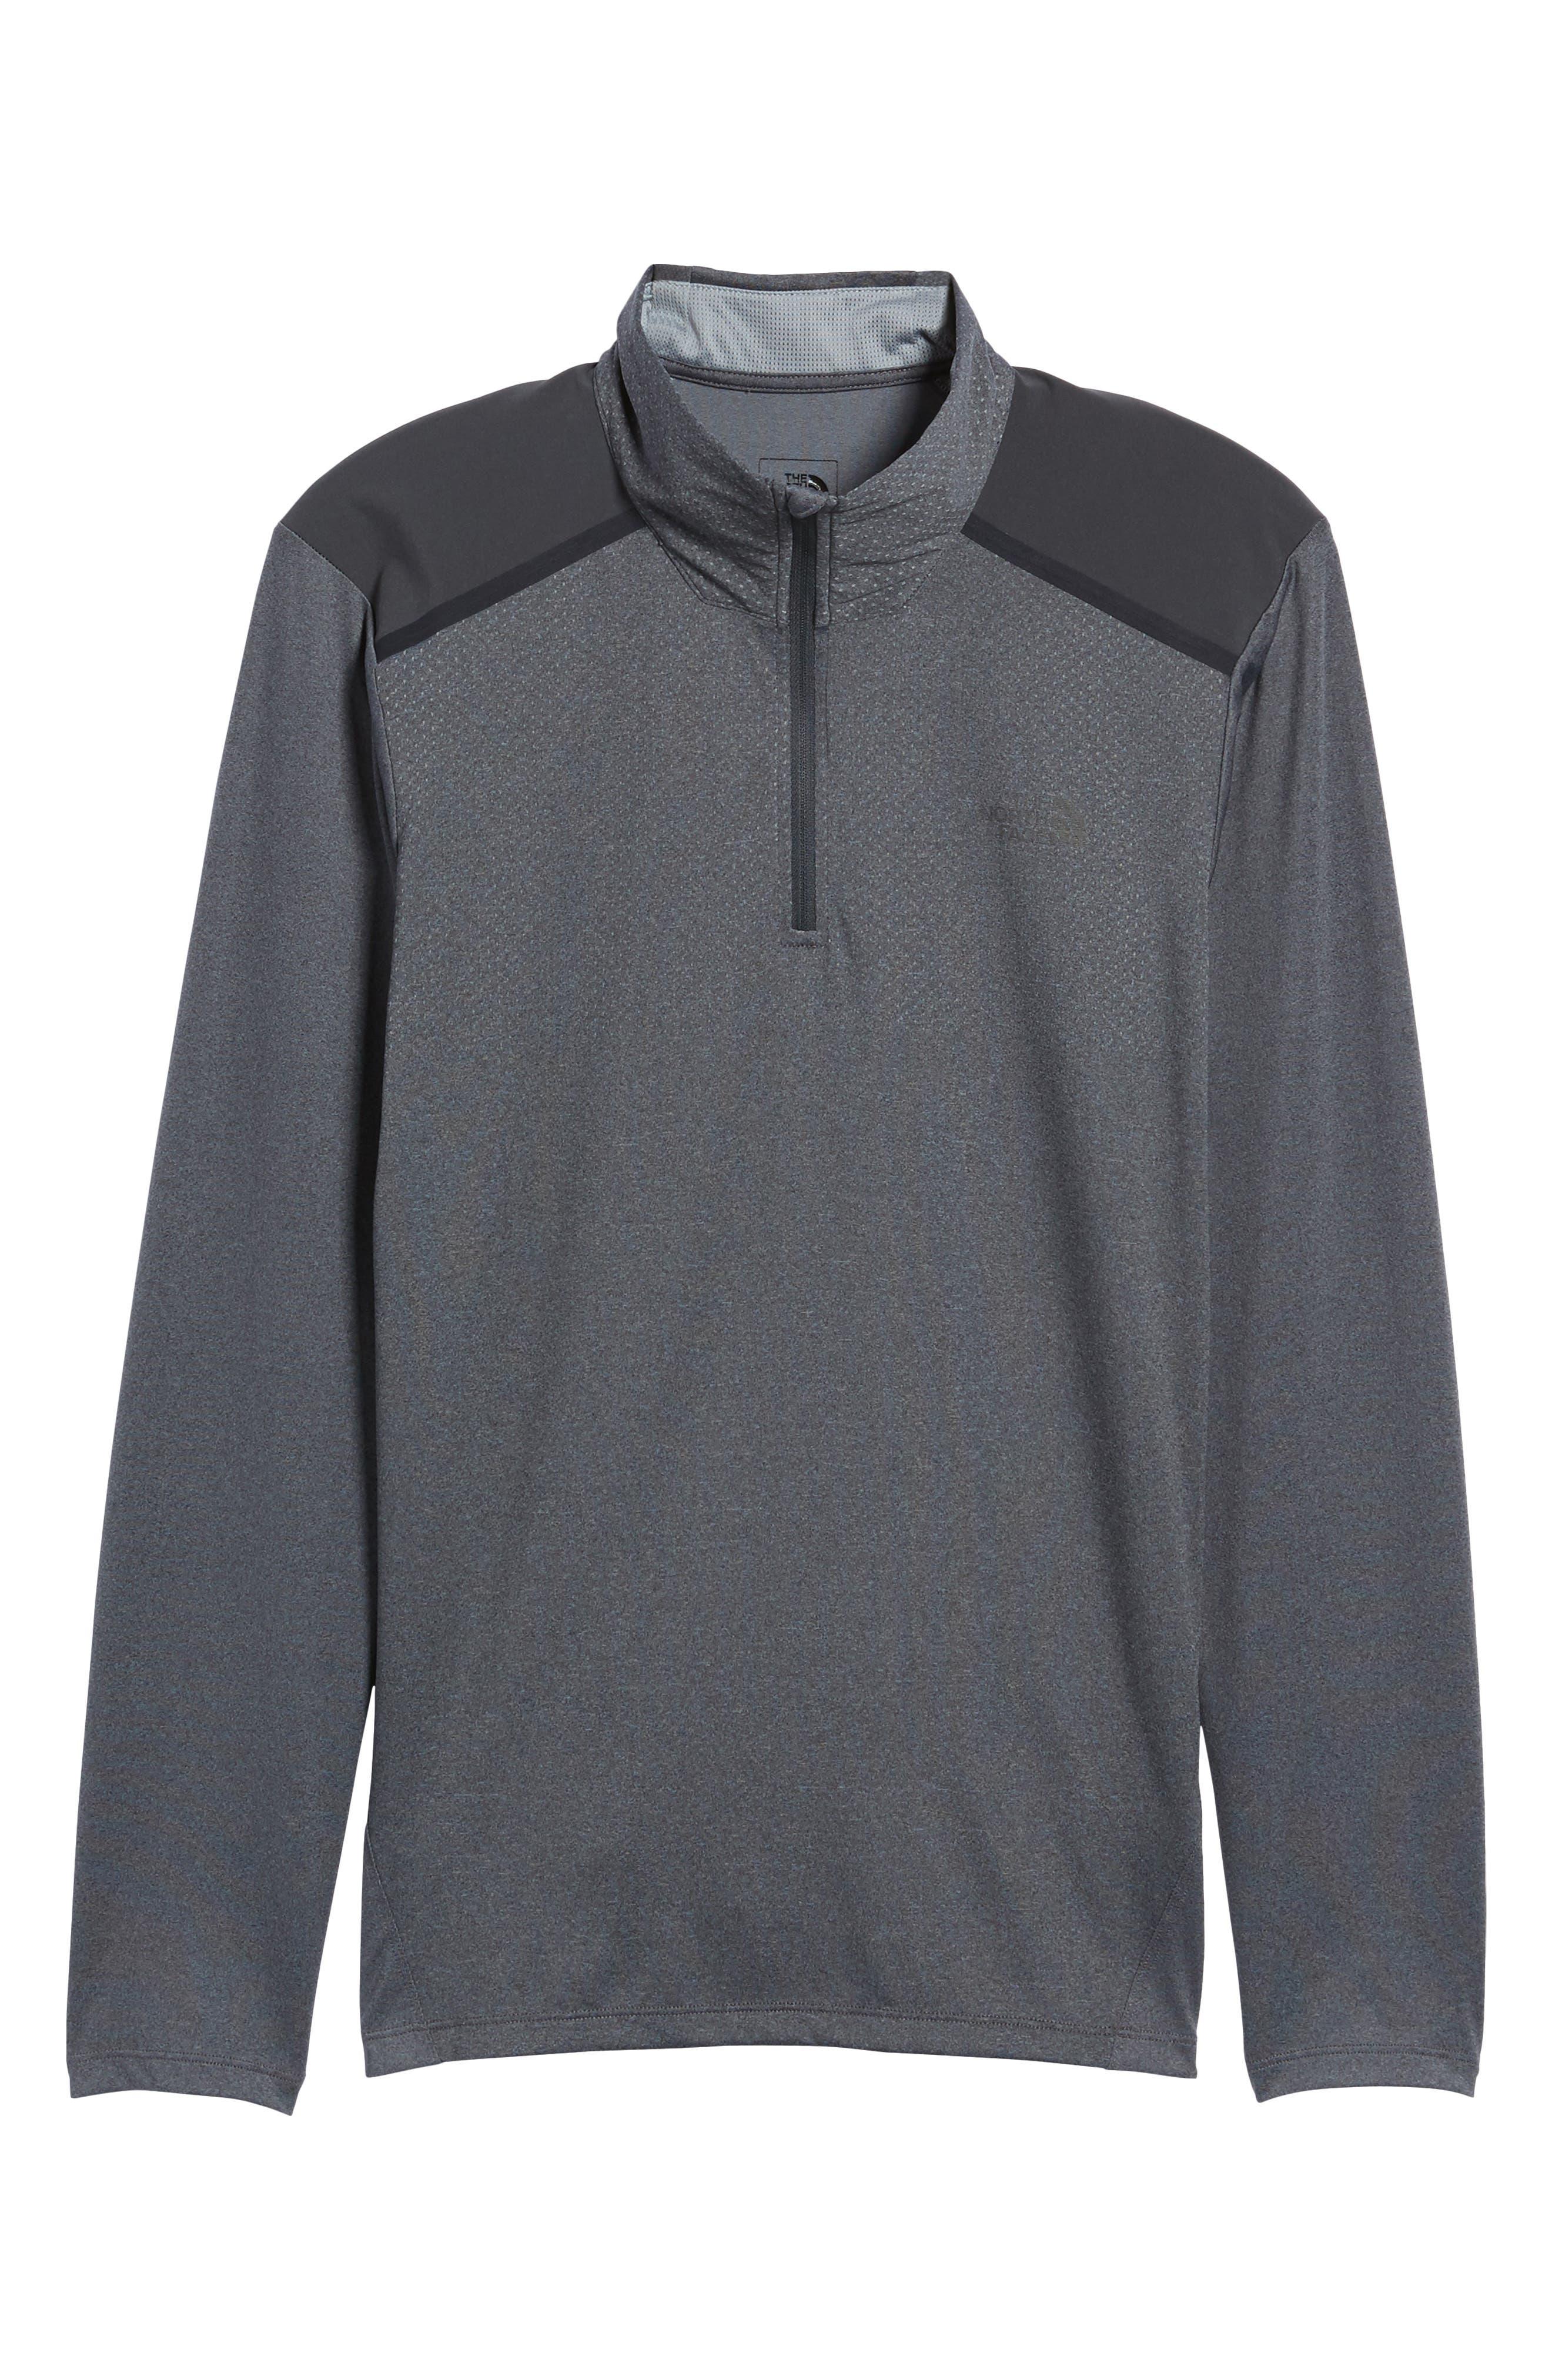 'Kilowatt' Quarter Zip Training Pullover,                             Alternate thumbnail 22, color,